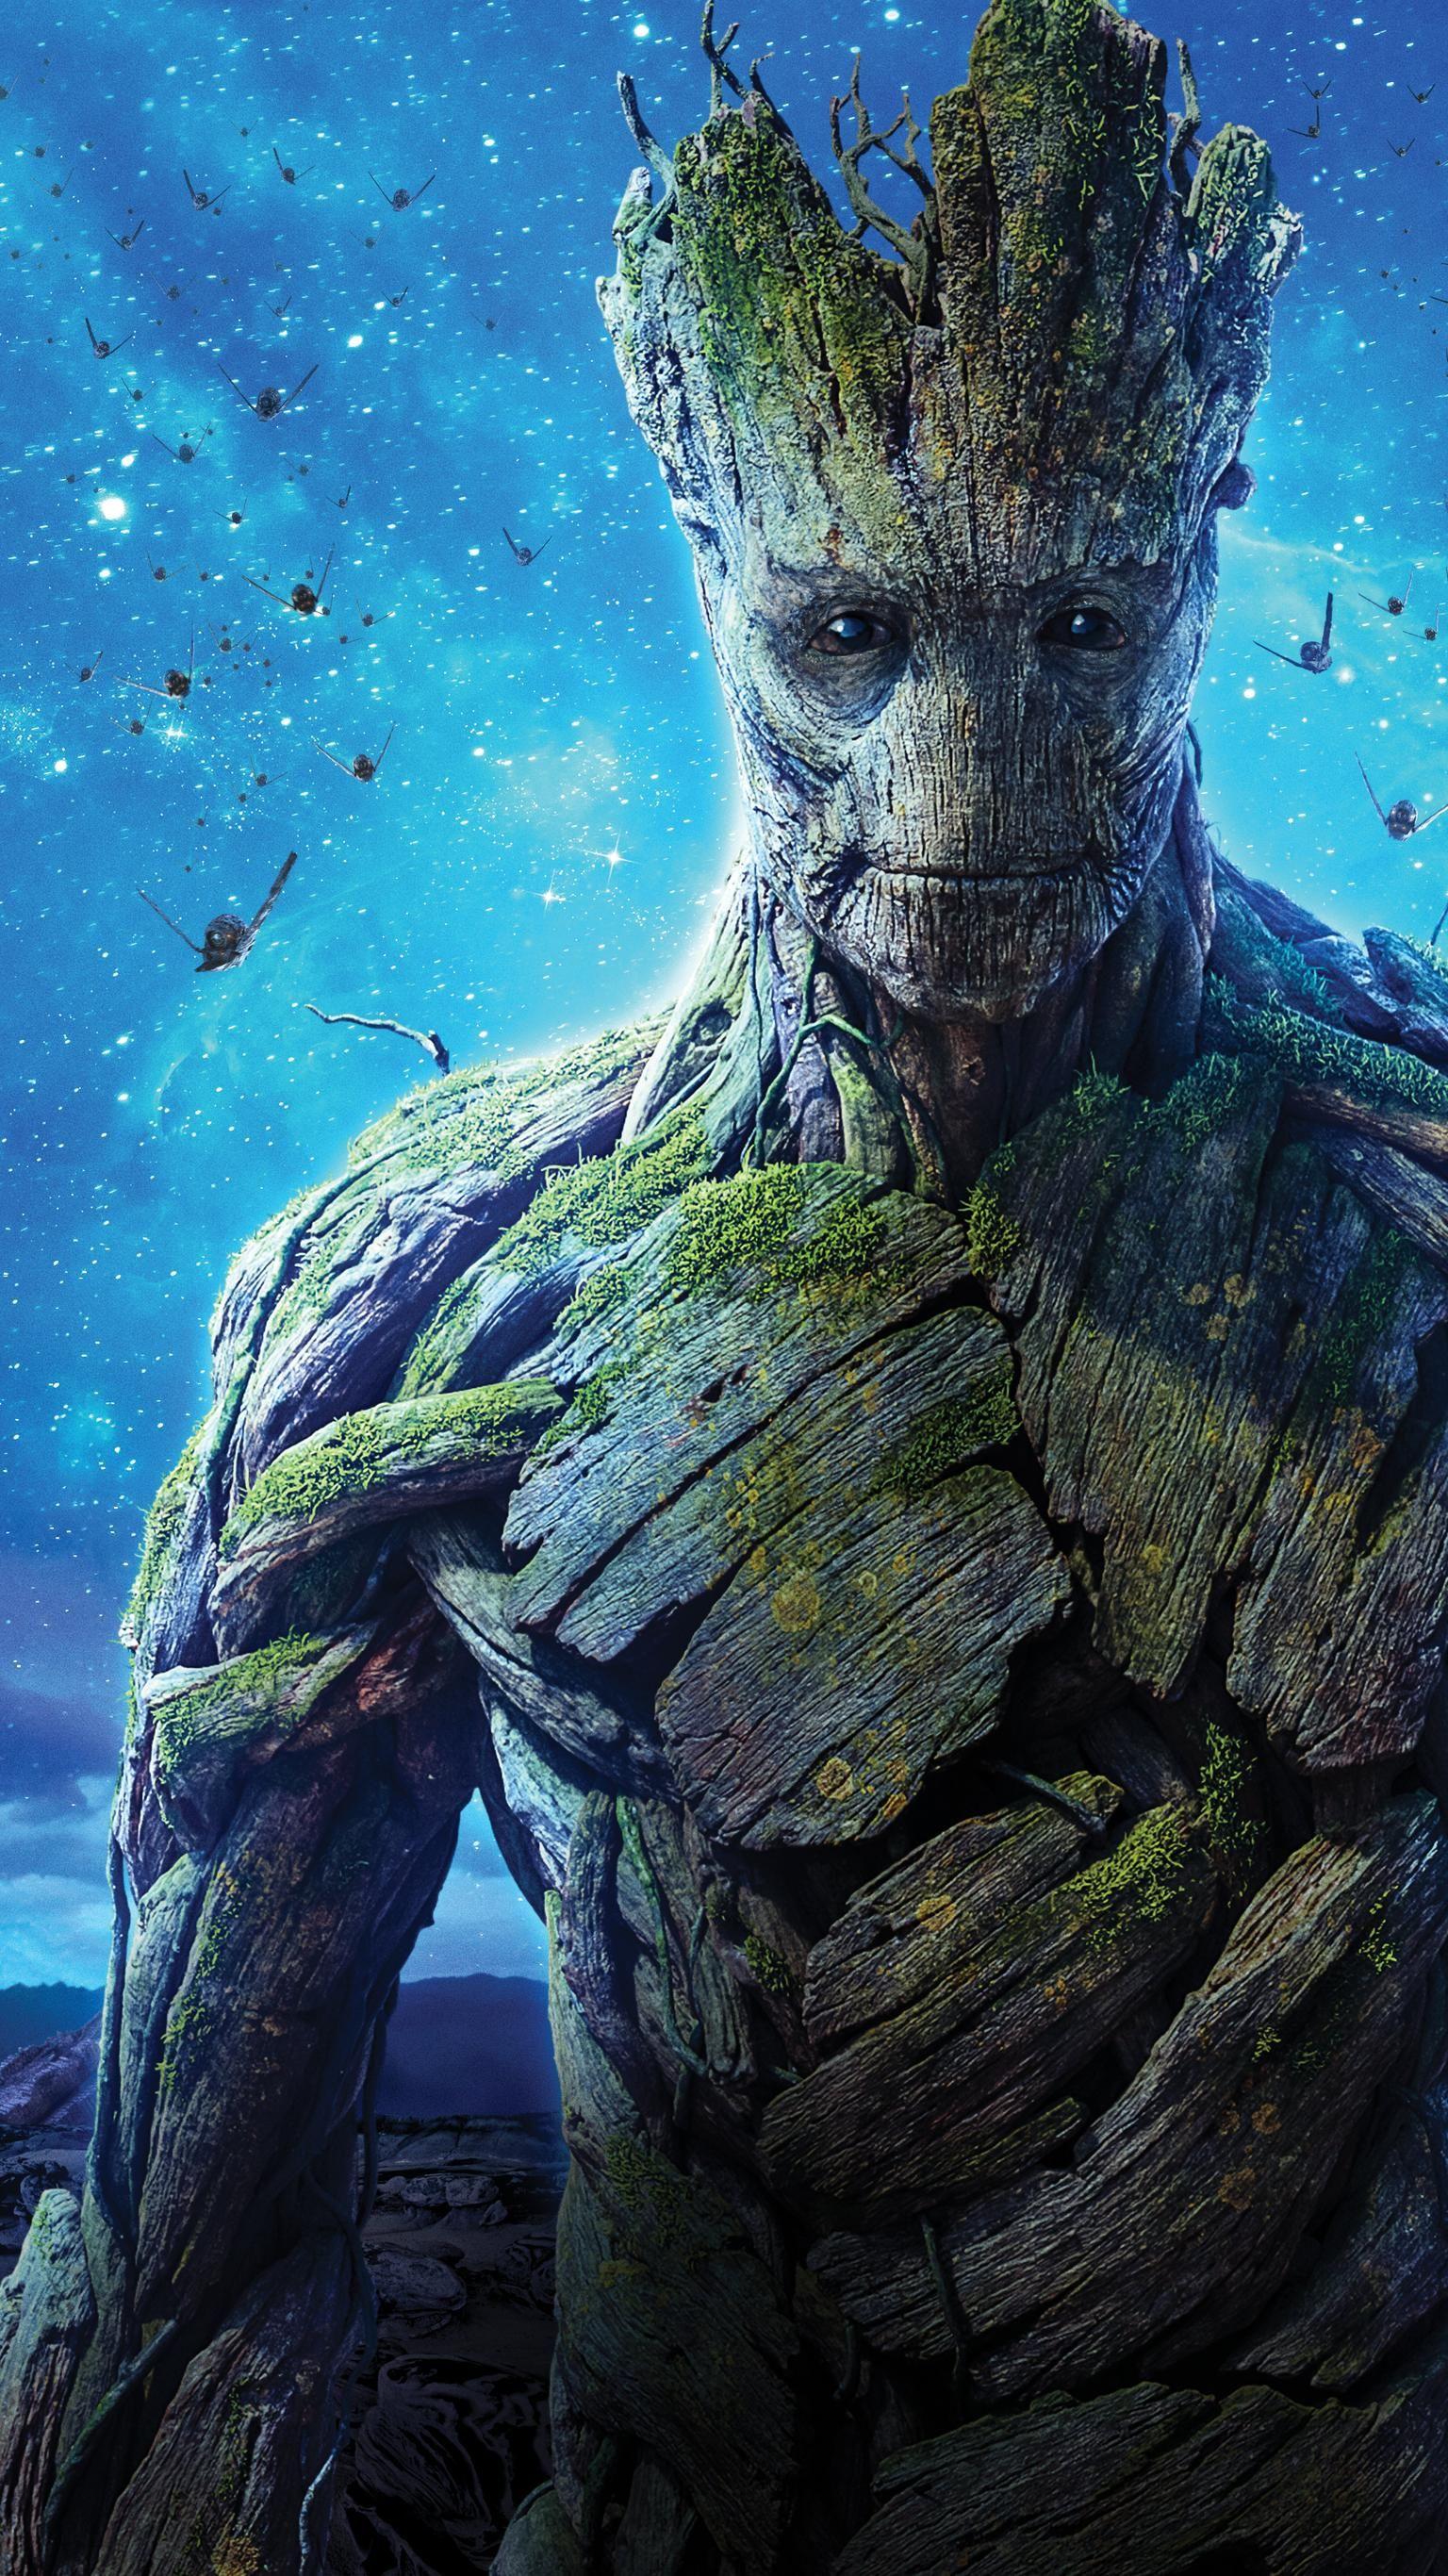 Guardians of the Galaxy (2014) Phone Wallpaper Mundo